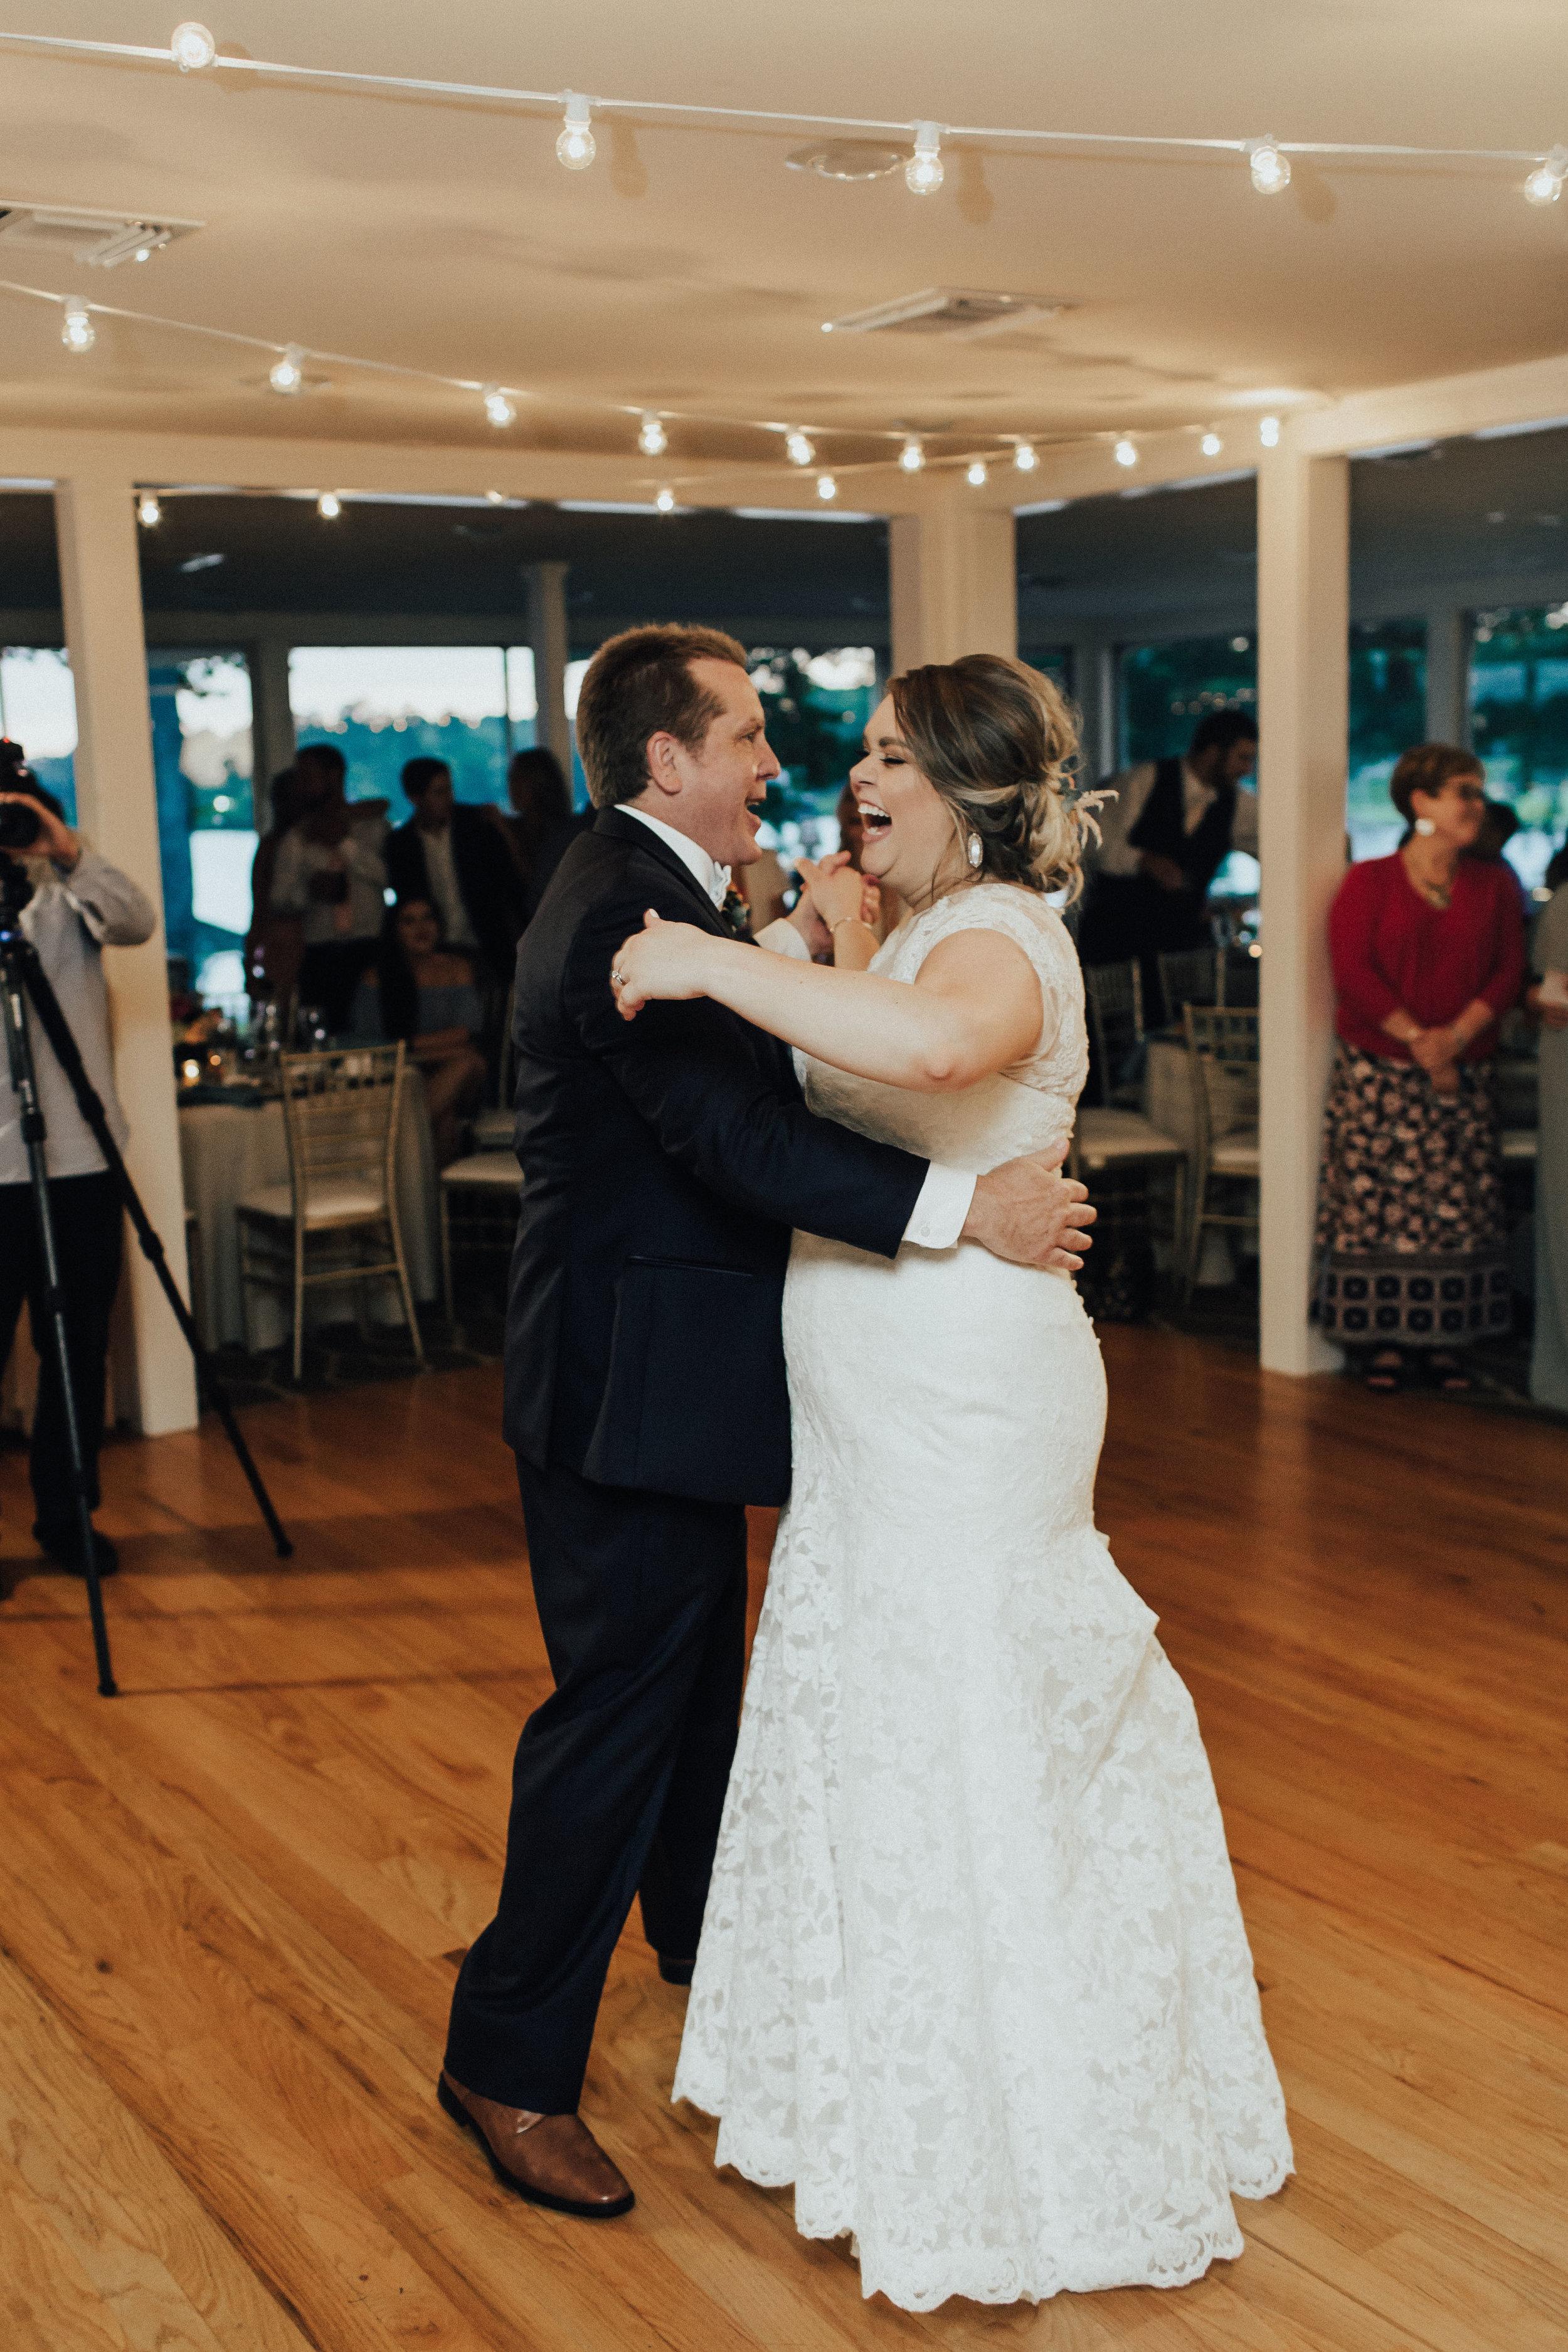 caitlin-jackson-wedding-photographer-lake-tyler-petroleum-club-texas--676.jpg